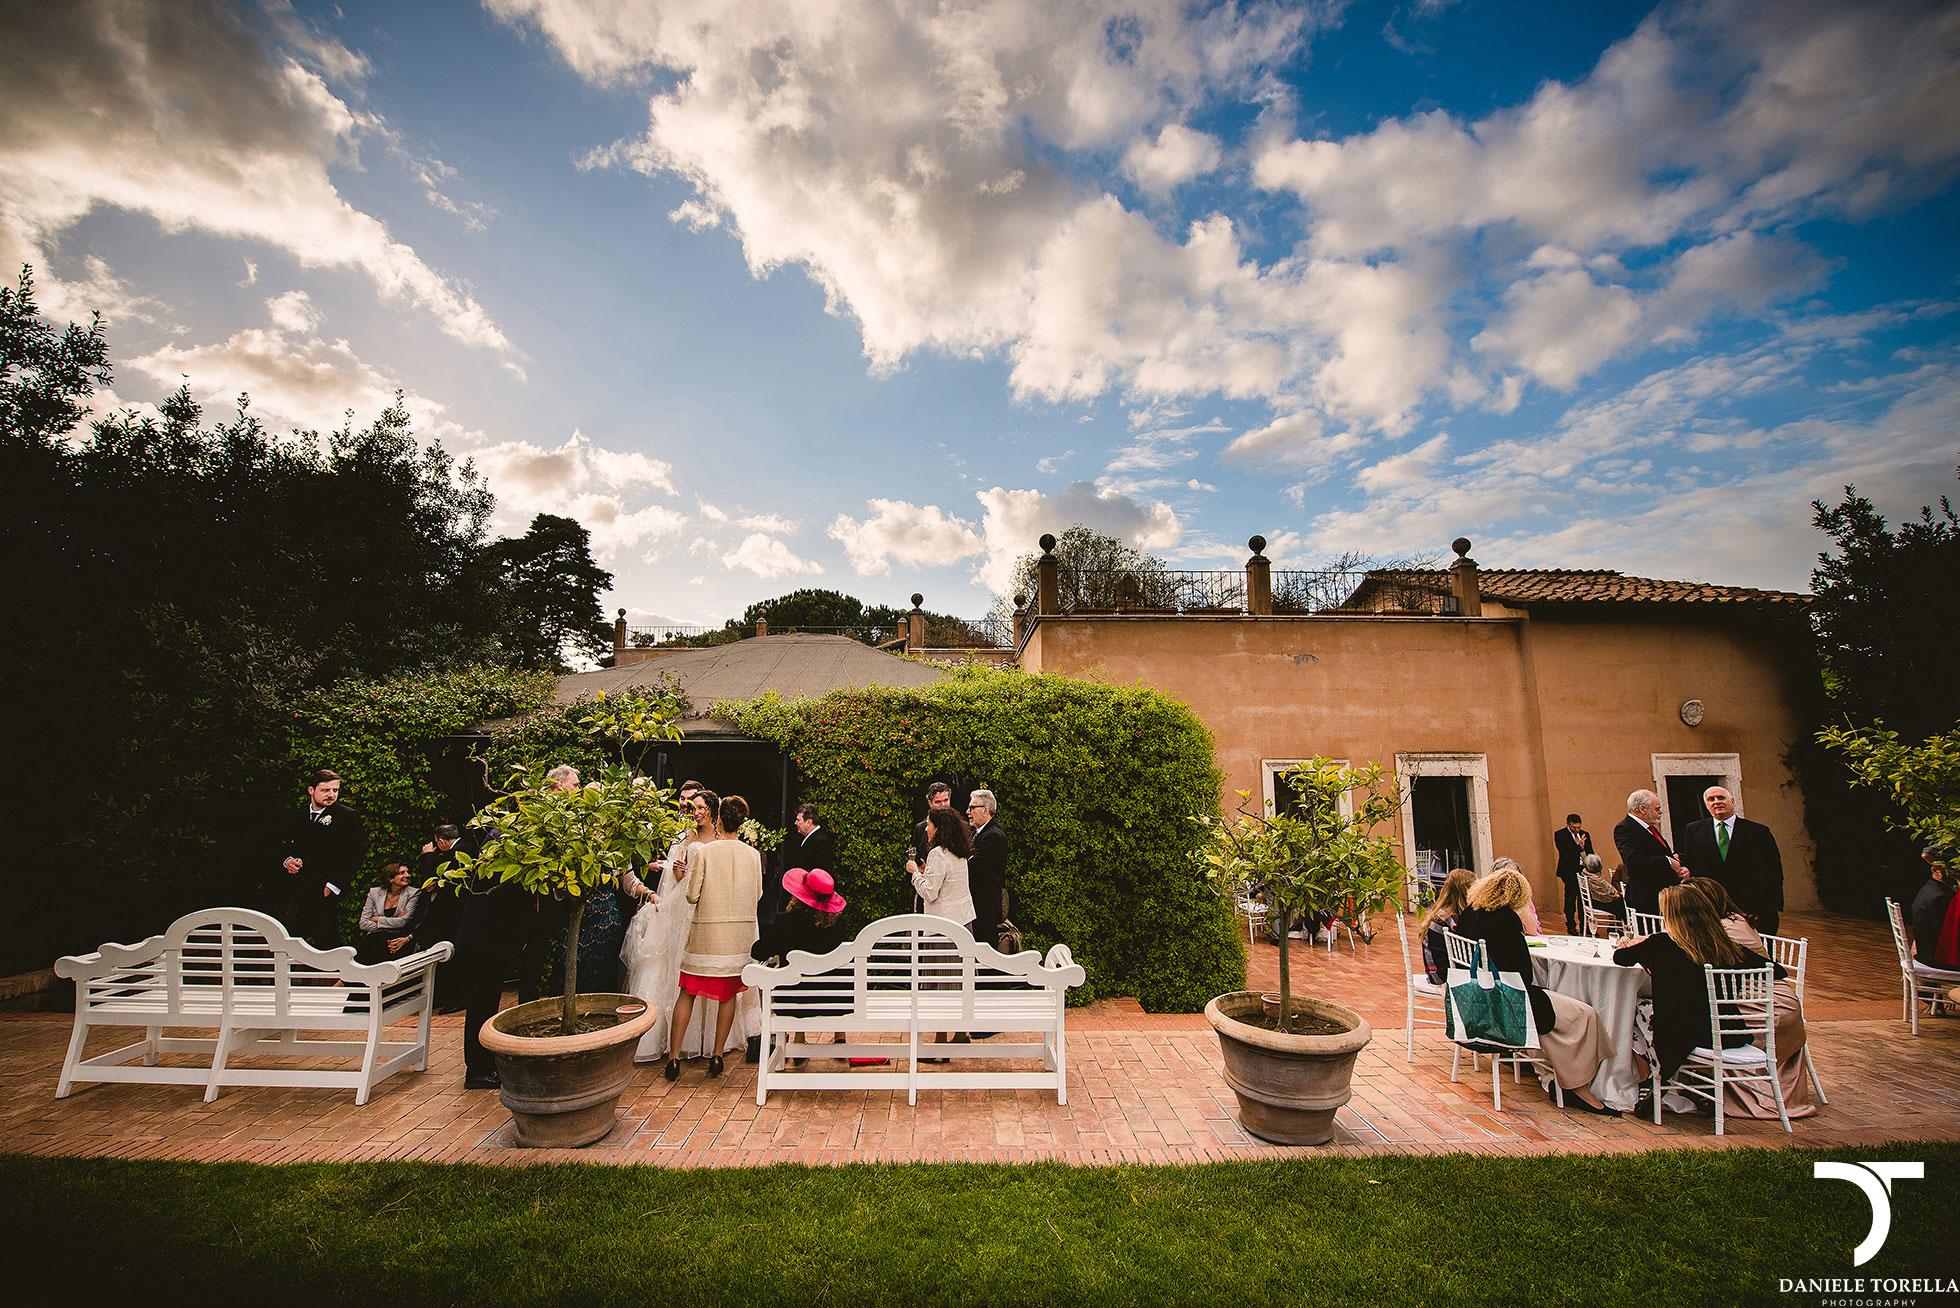 Matrimonio In Vigna : Matrimonio a vigna san sebastiano